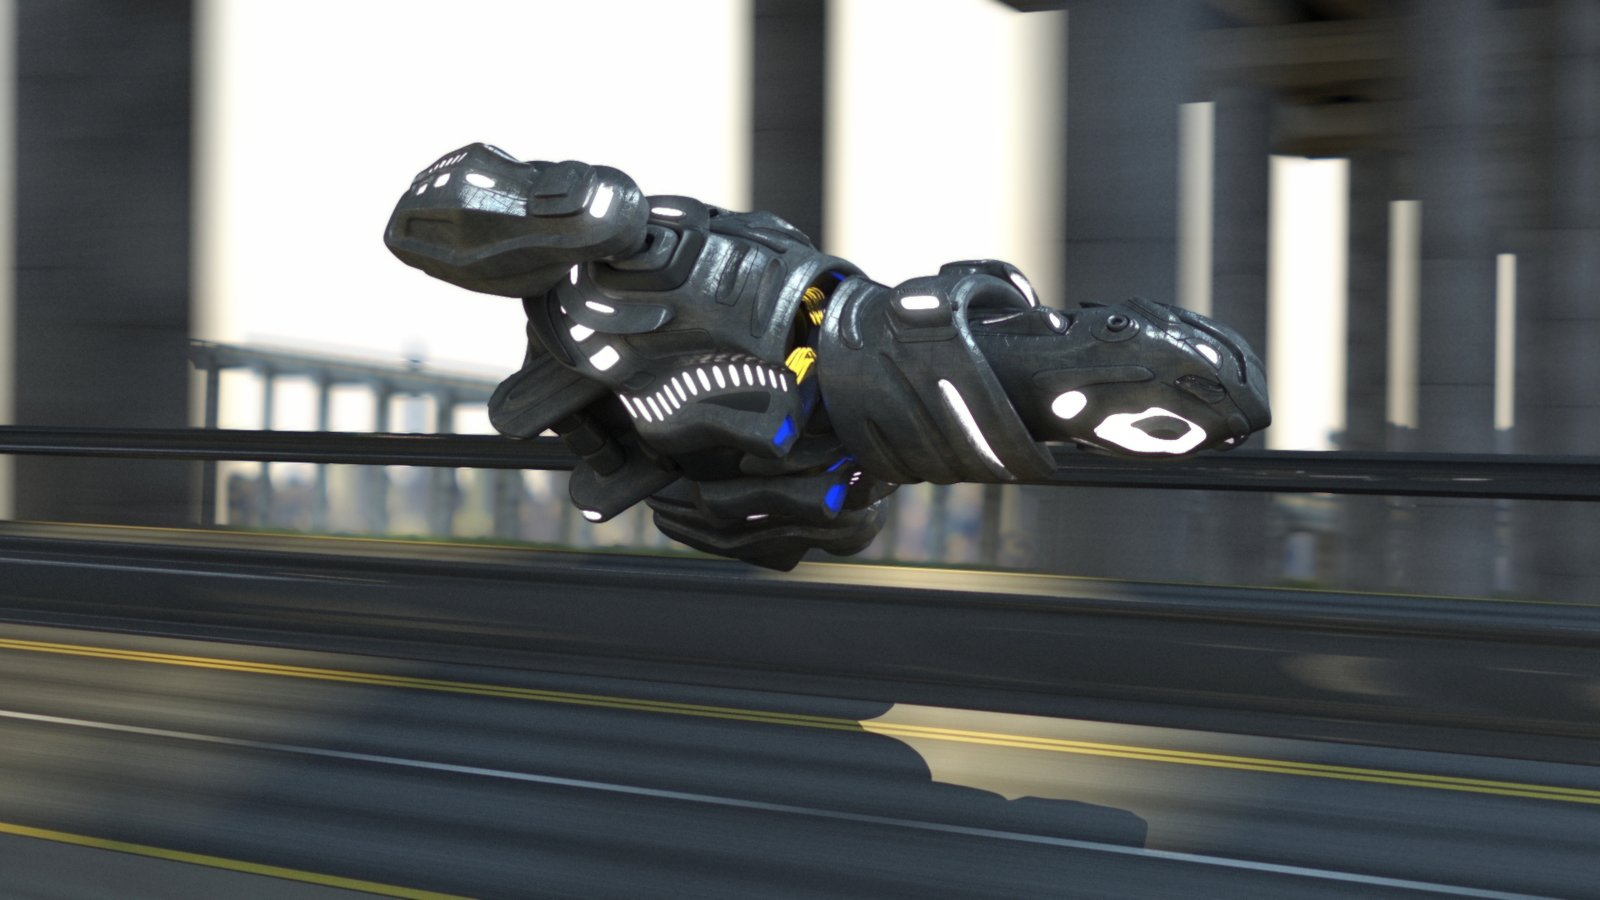 Spaceship (Egg-Hovercraft)